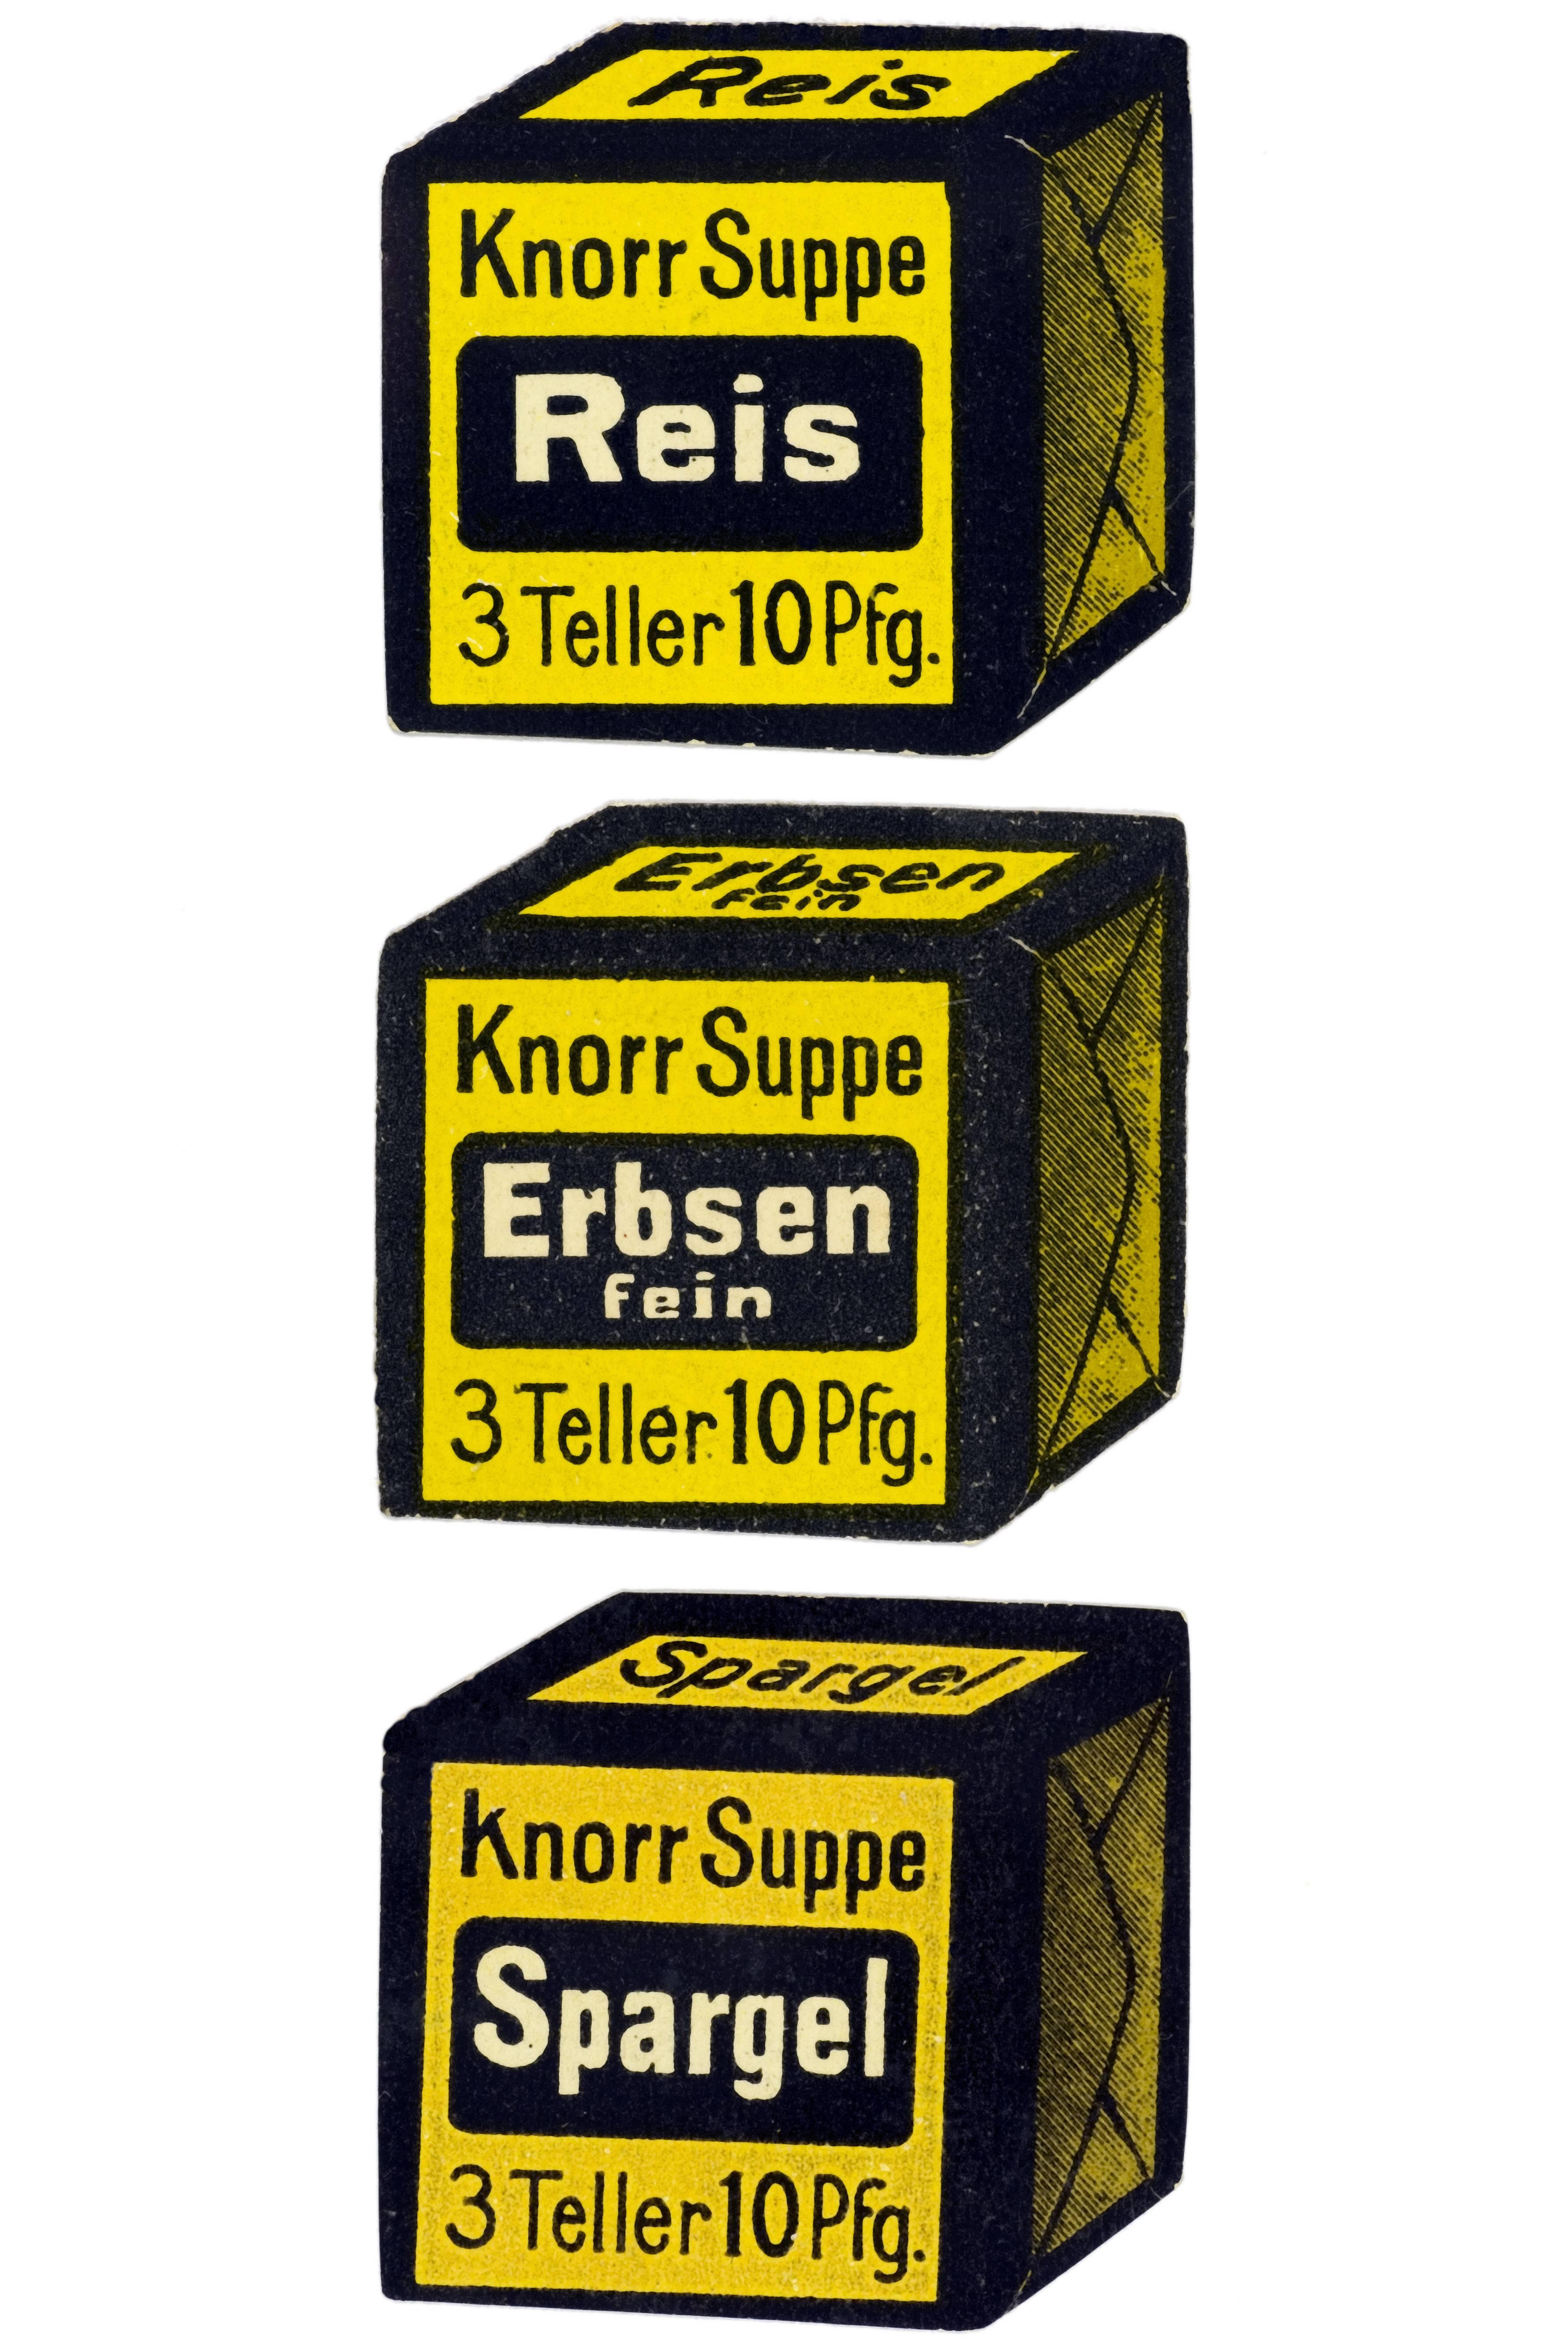 Bildnummer: 52856409 Datum: 30.12.2007 Copyright: imago/imagebroker Reklamemarke - Knorr Suppe -, Objekte; 2007, Werbung, Schriftzug, Studioaufnahme, C. H. Knorr AG, Reis, Erbsen, Spargel,; , hoch, Kbdig, Gruppenbild, , Bildnummer 52856409 Date 30 12 2007 Copyright Imago imagebroker Advertising brand Knorr Soup Objects 2007 Advertising emblem Studio shooting C H Knorr AG Rice Peas Asparagus vertical Kbdig Group photo